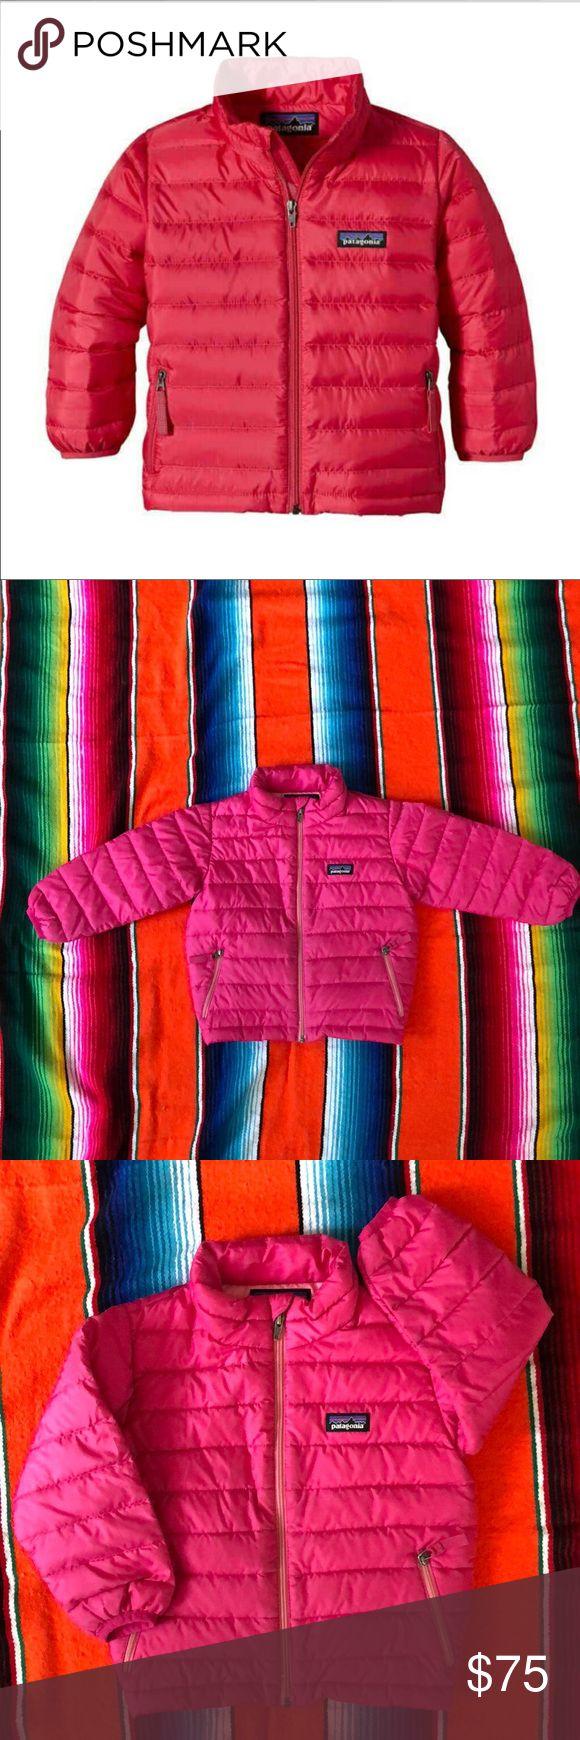 Patagonia Puffer Jacket little girls 2t Puffer jackets